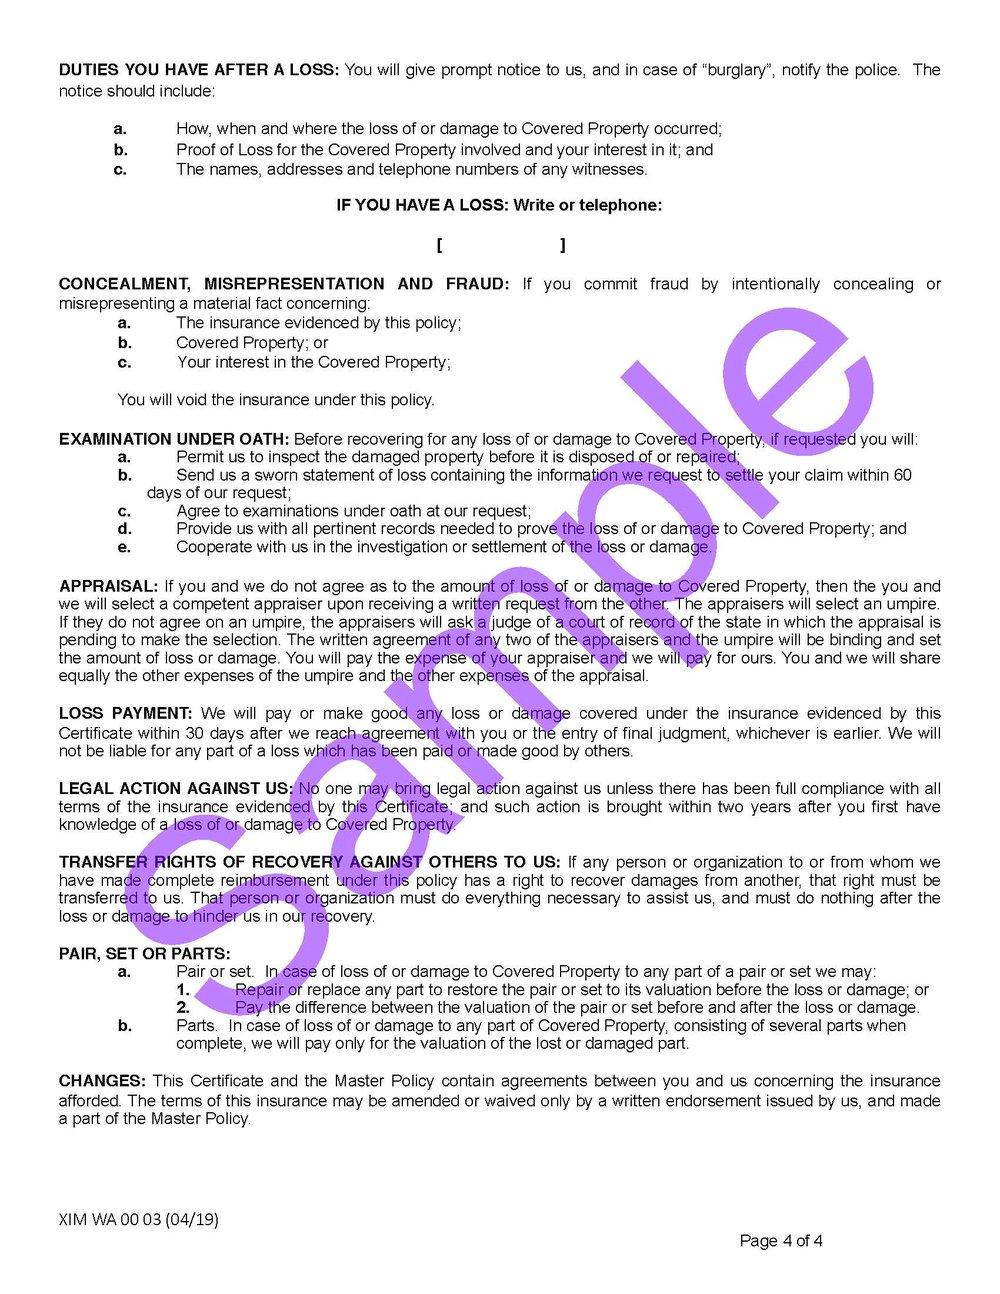 XIM WA 00 03 04 19 Washington Certificate of InsuranceSample_Page_4.jpg